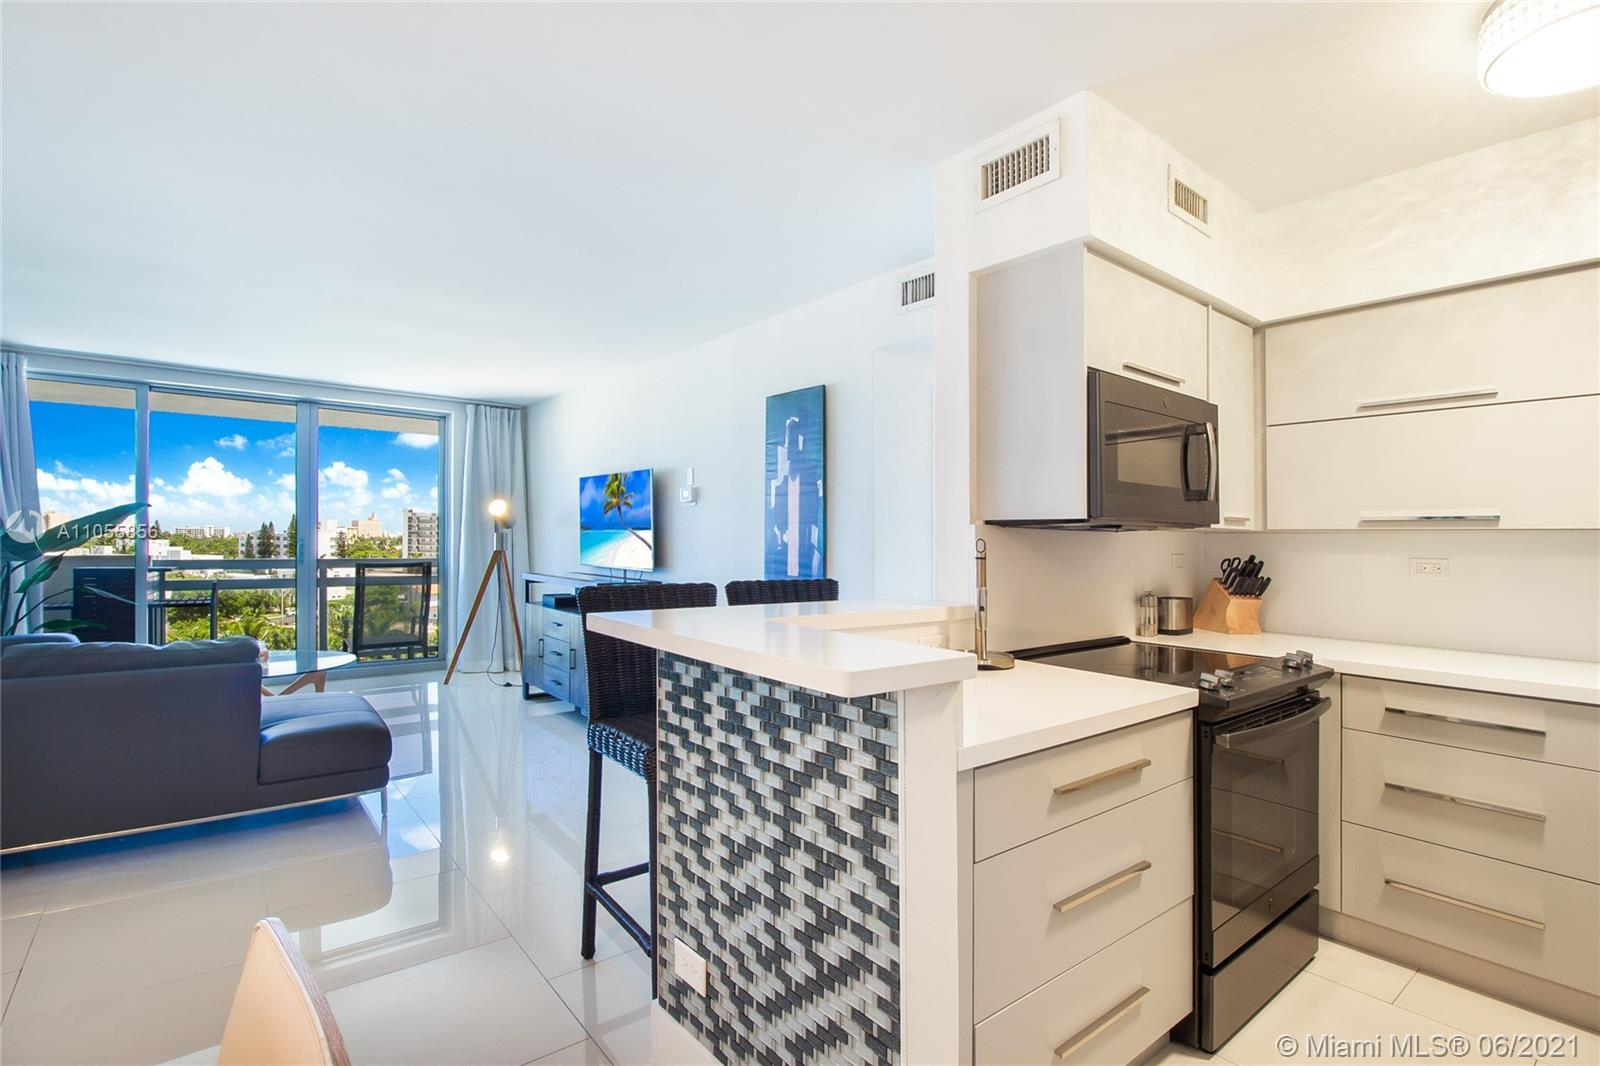 Updated 1 bedroom/1 bathroom in the resort style Flamingo Condo. Unit features impact windows & blac